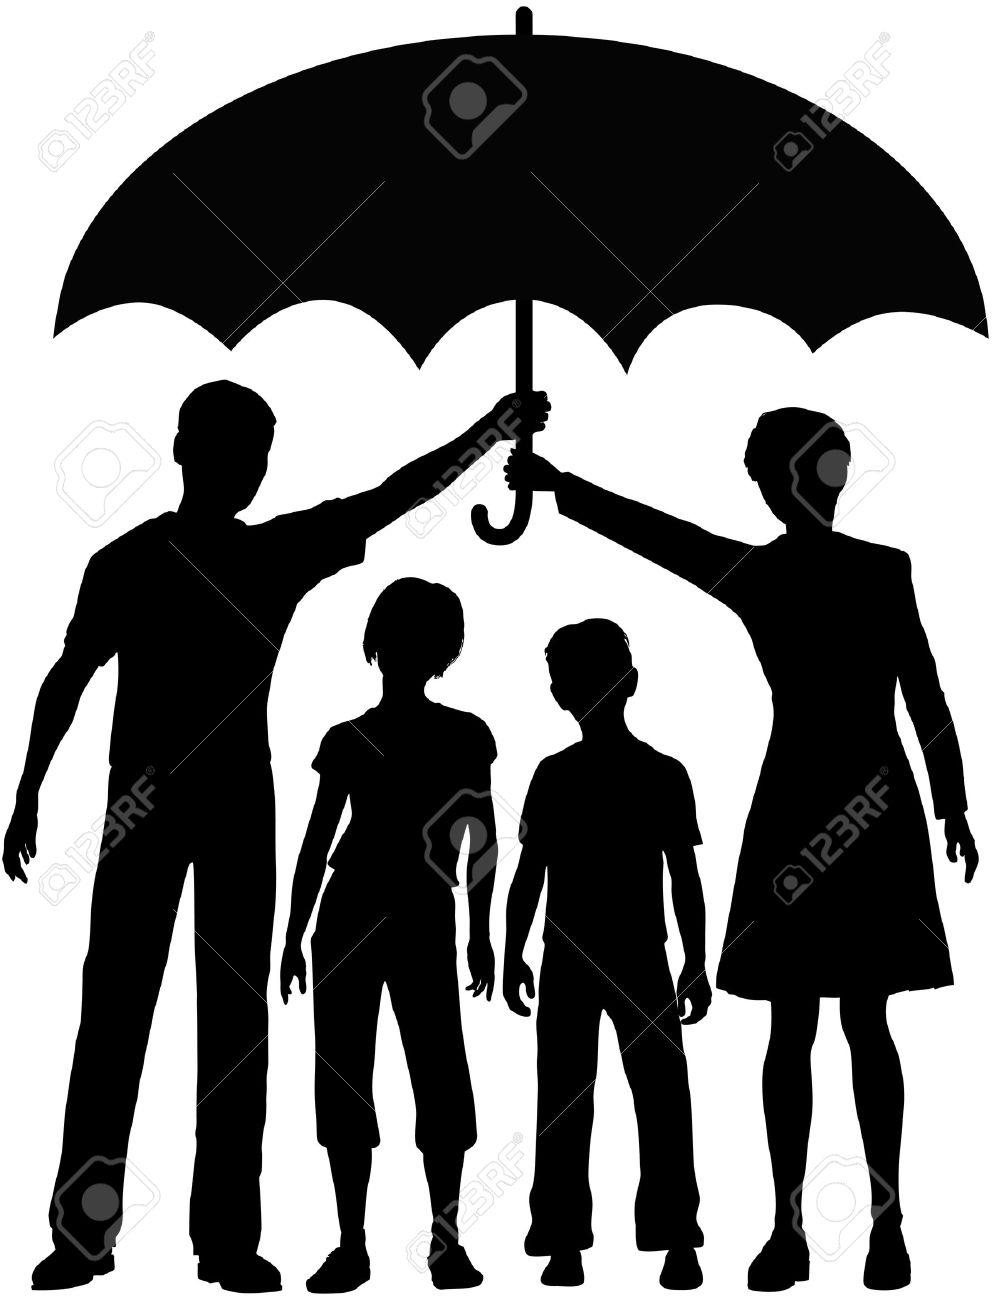 999x1300 Umbrella Clipart Silhouette Kid